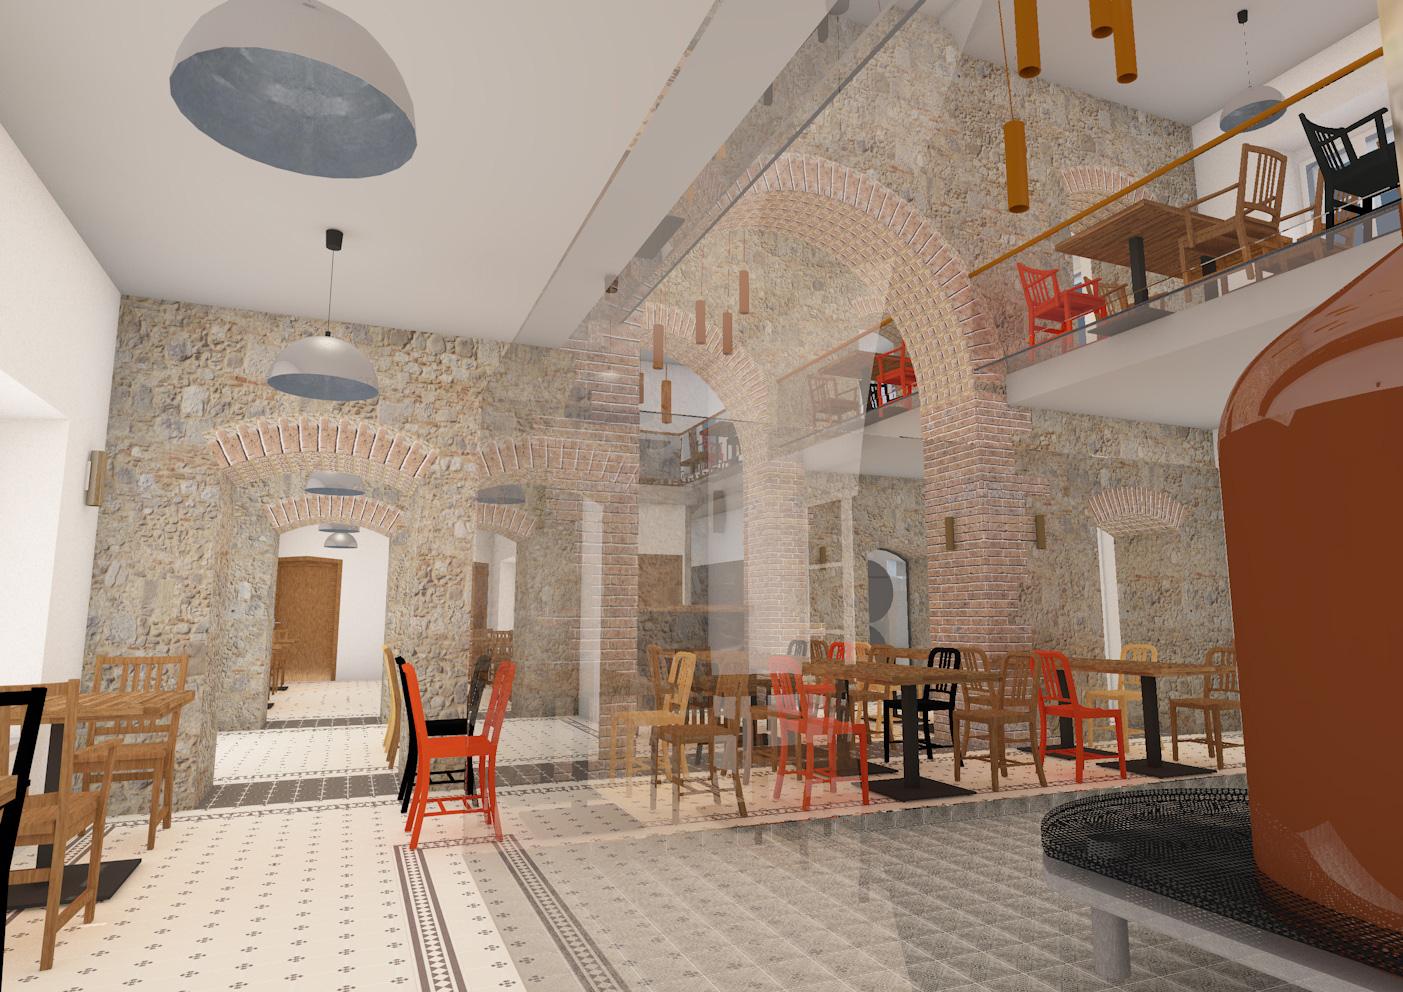 browar donnesmarckow, hotel, palac, biuro projektowe